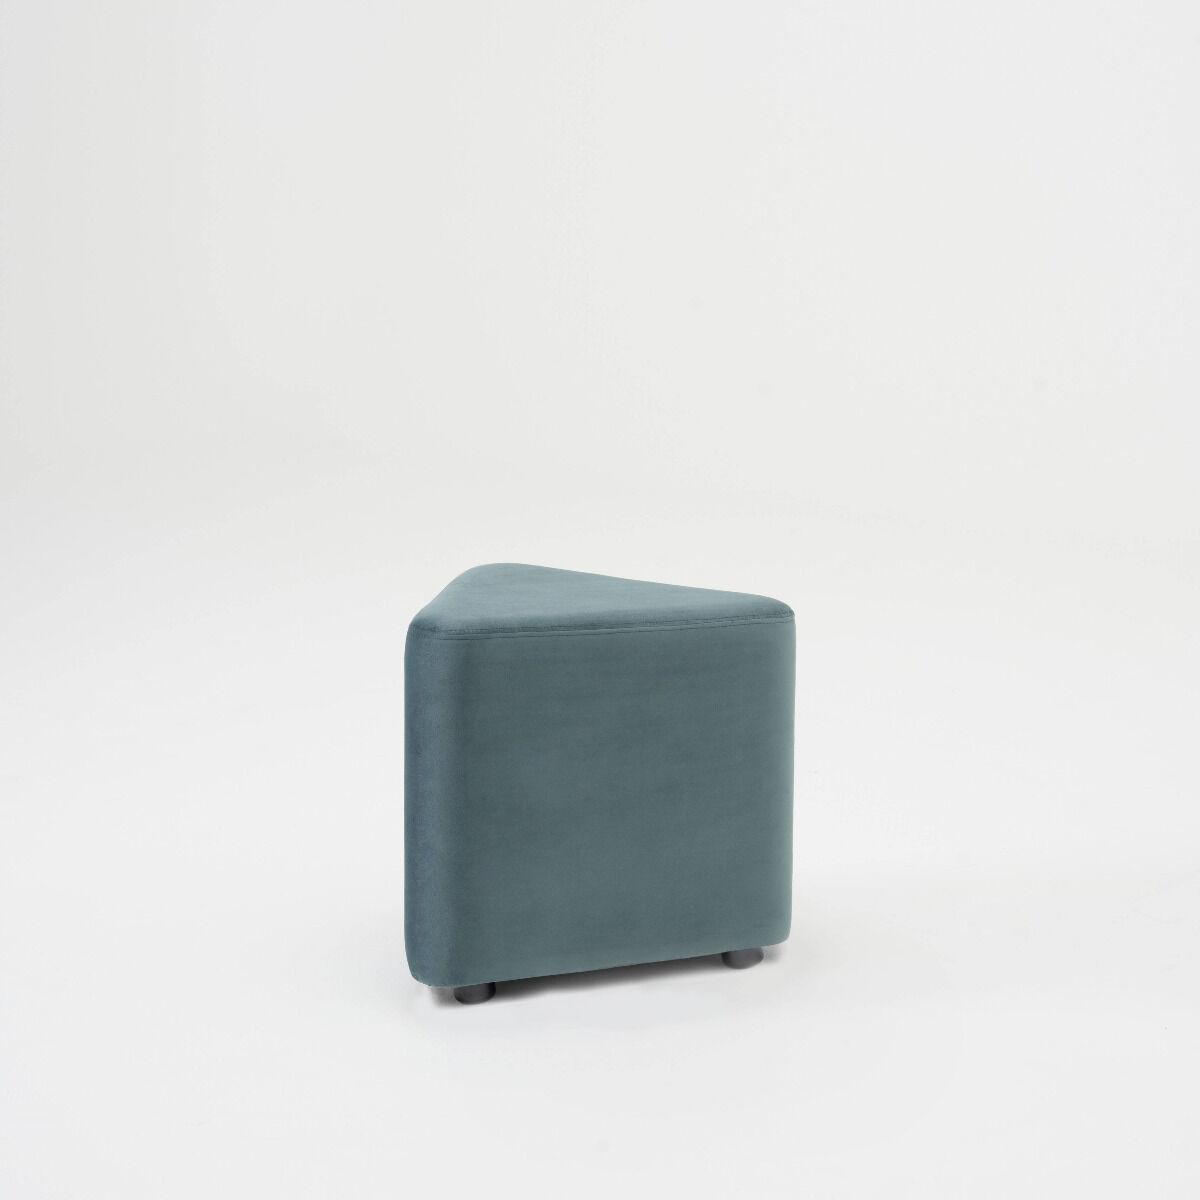 Mix pouf Fabric: River Colour: Rv87